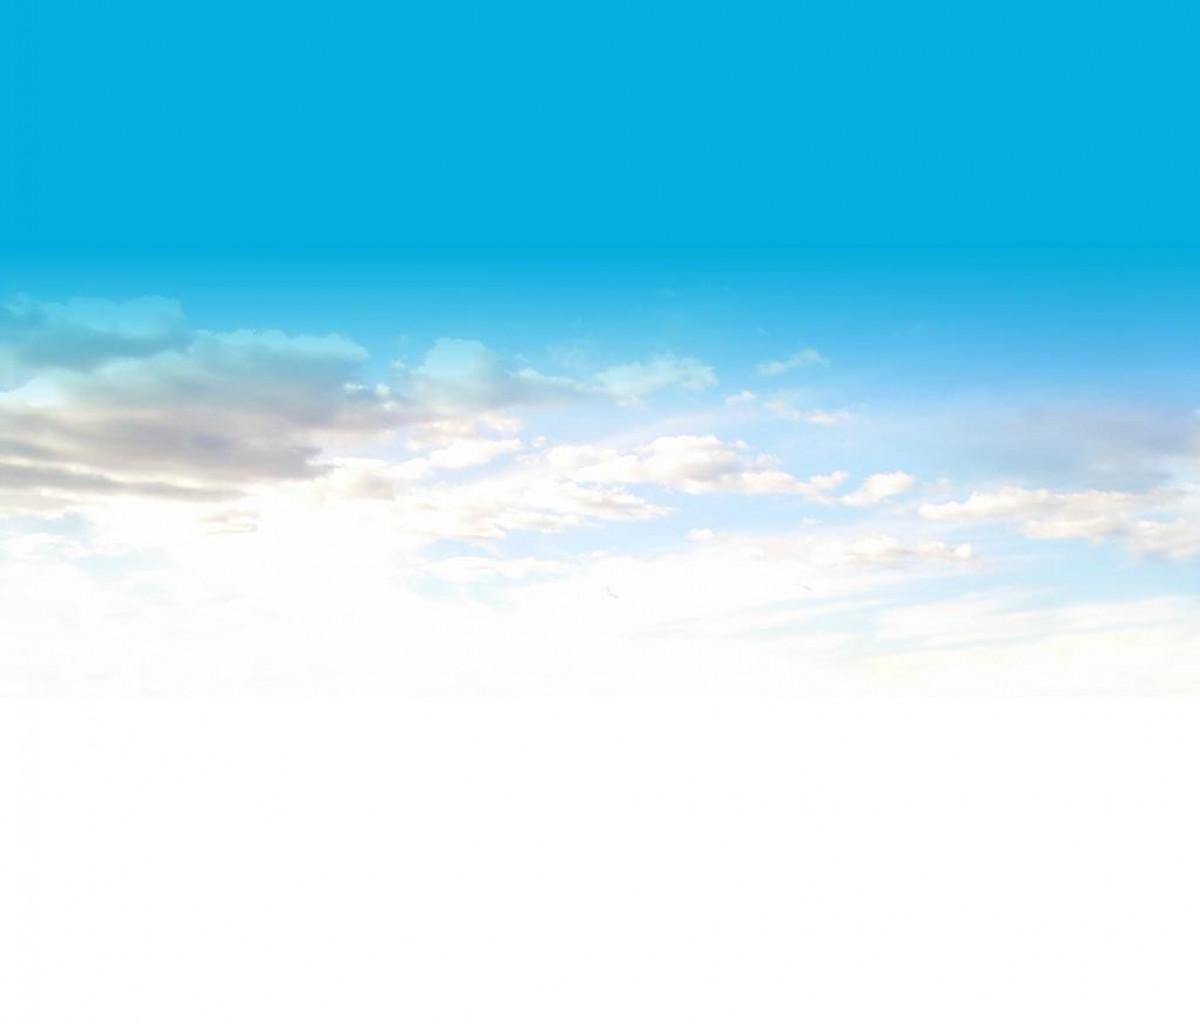 http://1.bp.blogspot.com/-0-KPDuxG7FA/T6uUHAh4R2I/AAAAAAAACjY/6TPByAmpw60/s1600/TabletPC-infinite-sky-1200x1024.jpg